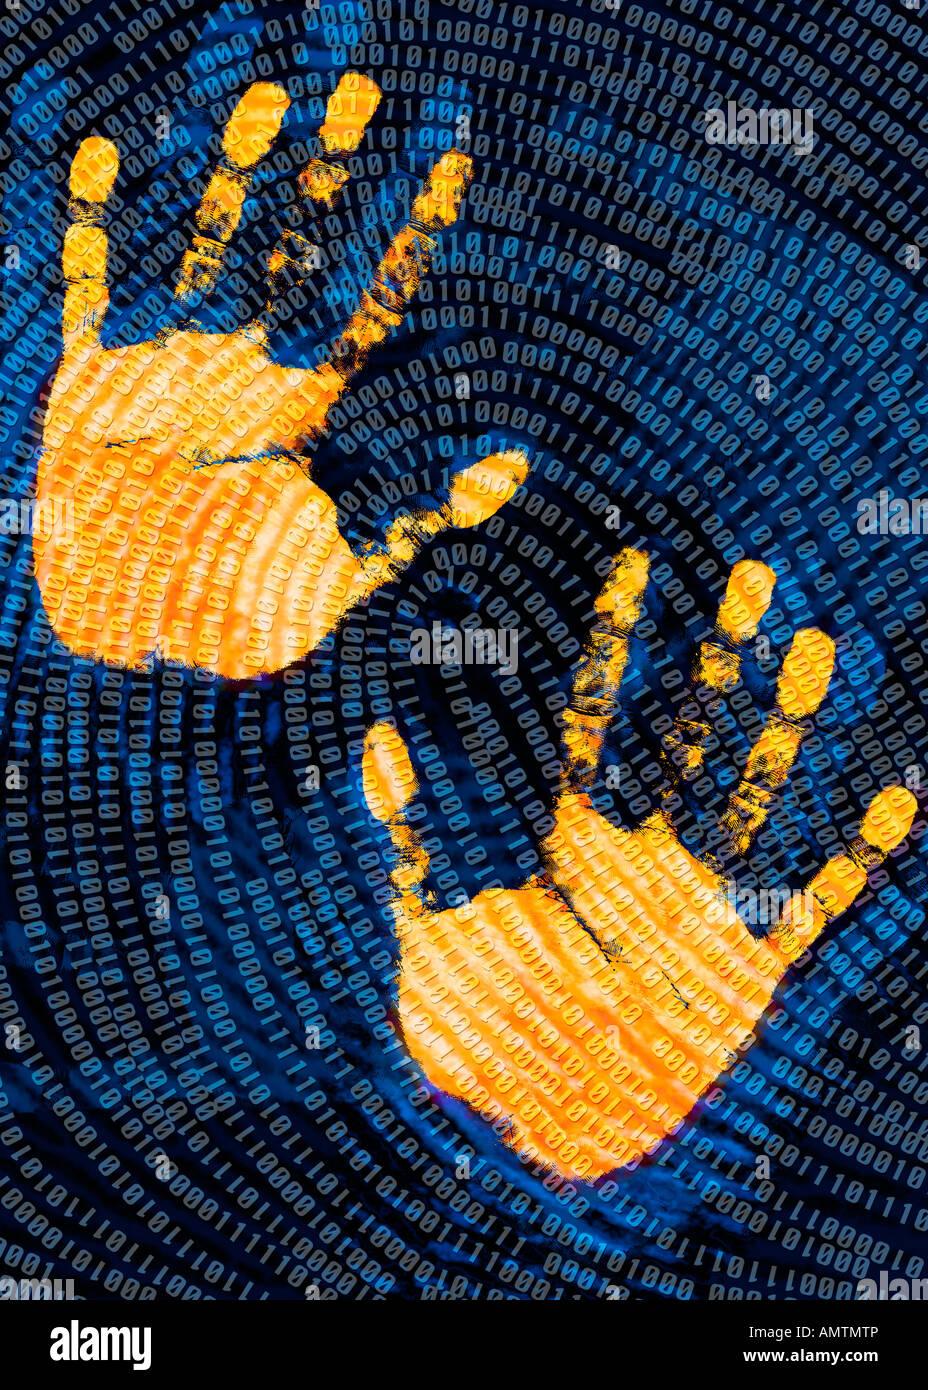 Digital Handprint Stock Photo 15335781 Alamy